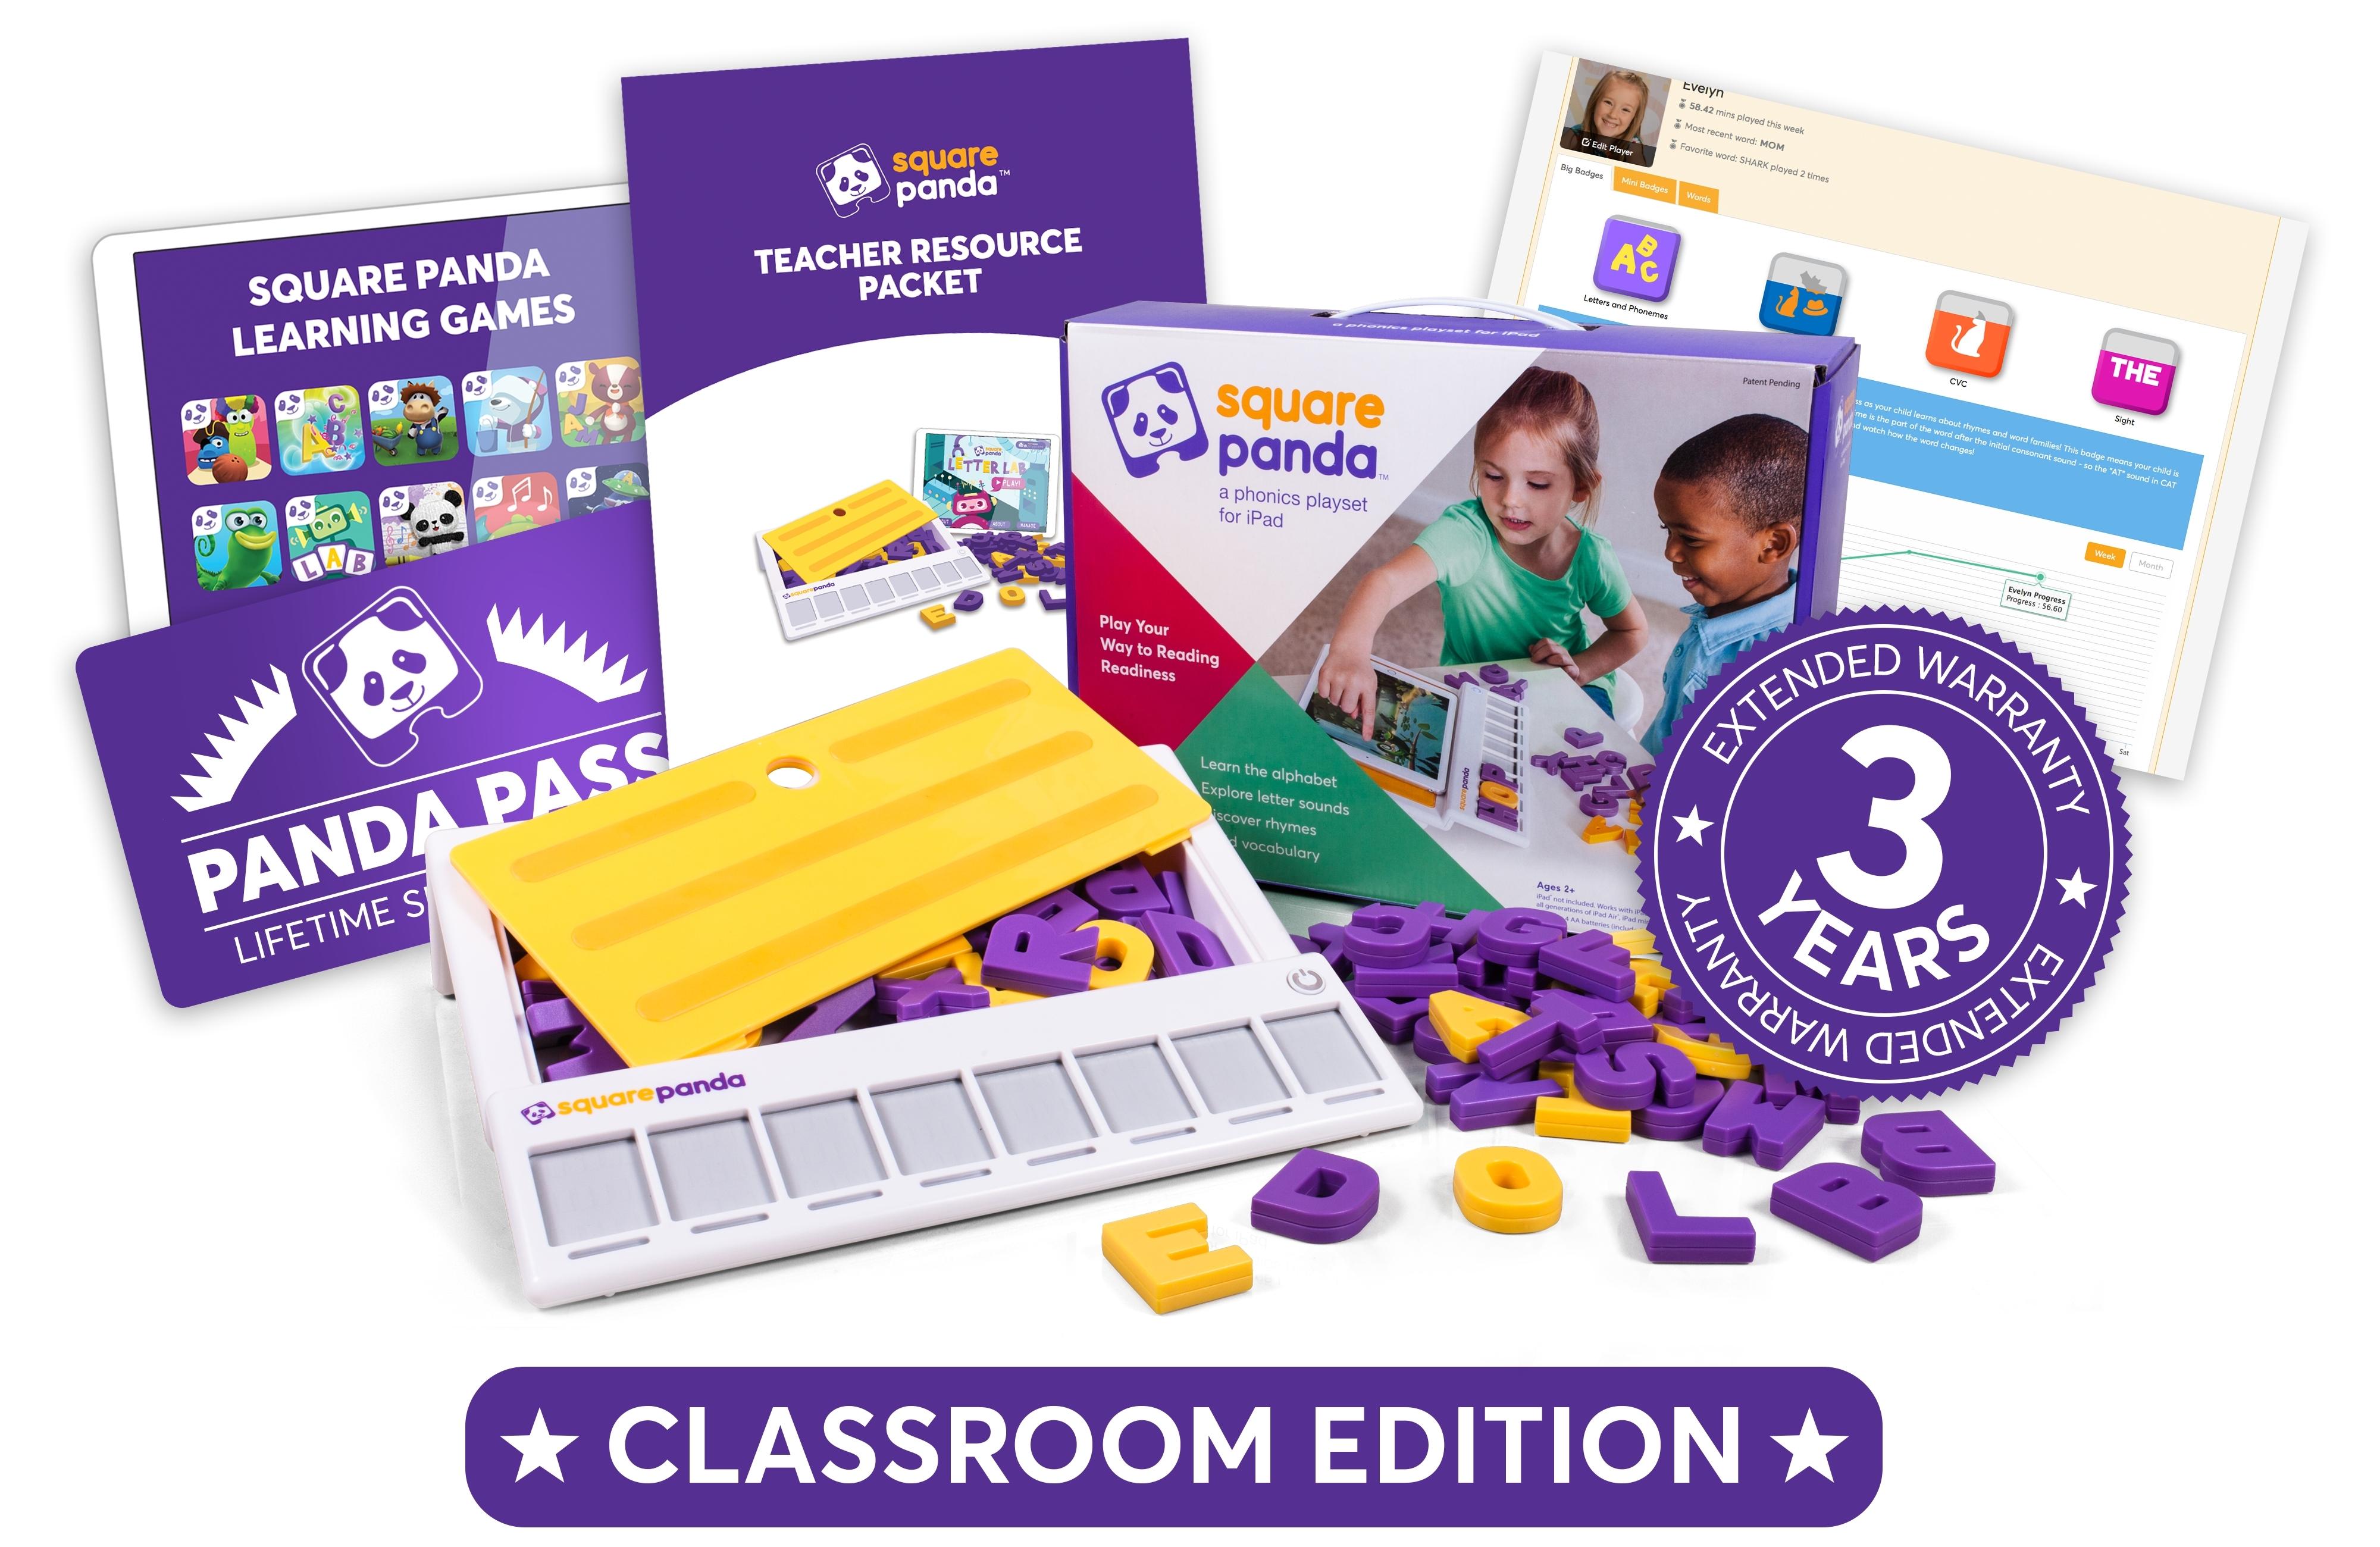 Square Panda™ Announces Classroom Edition for Schools